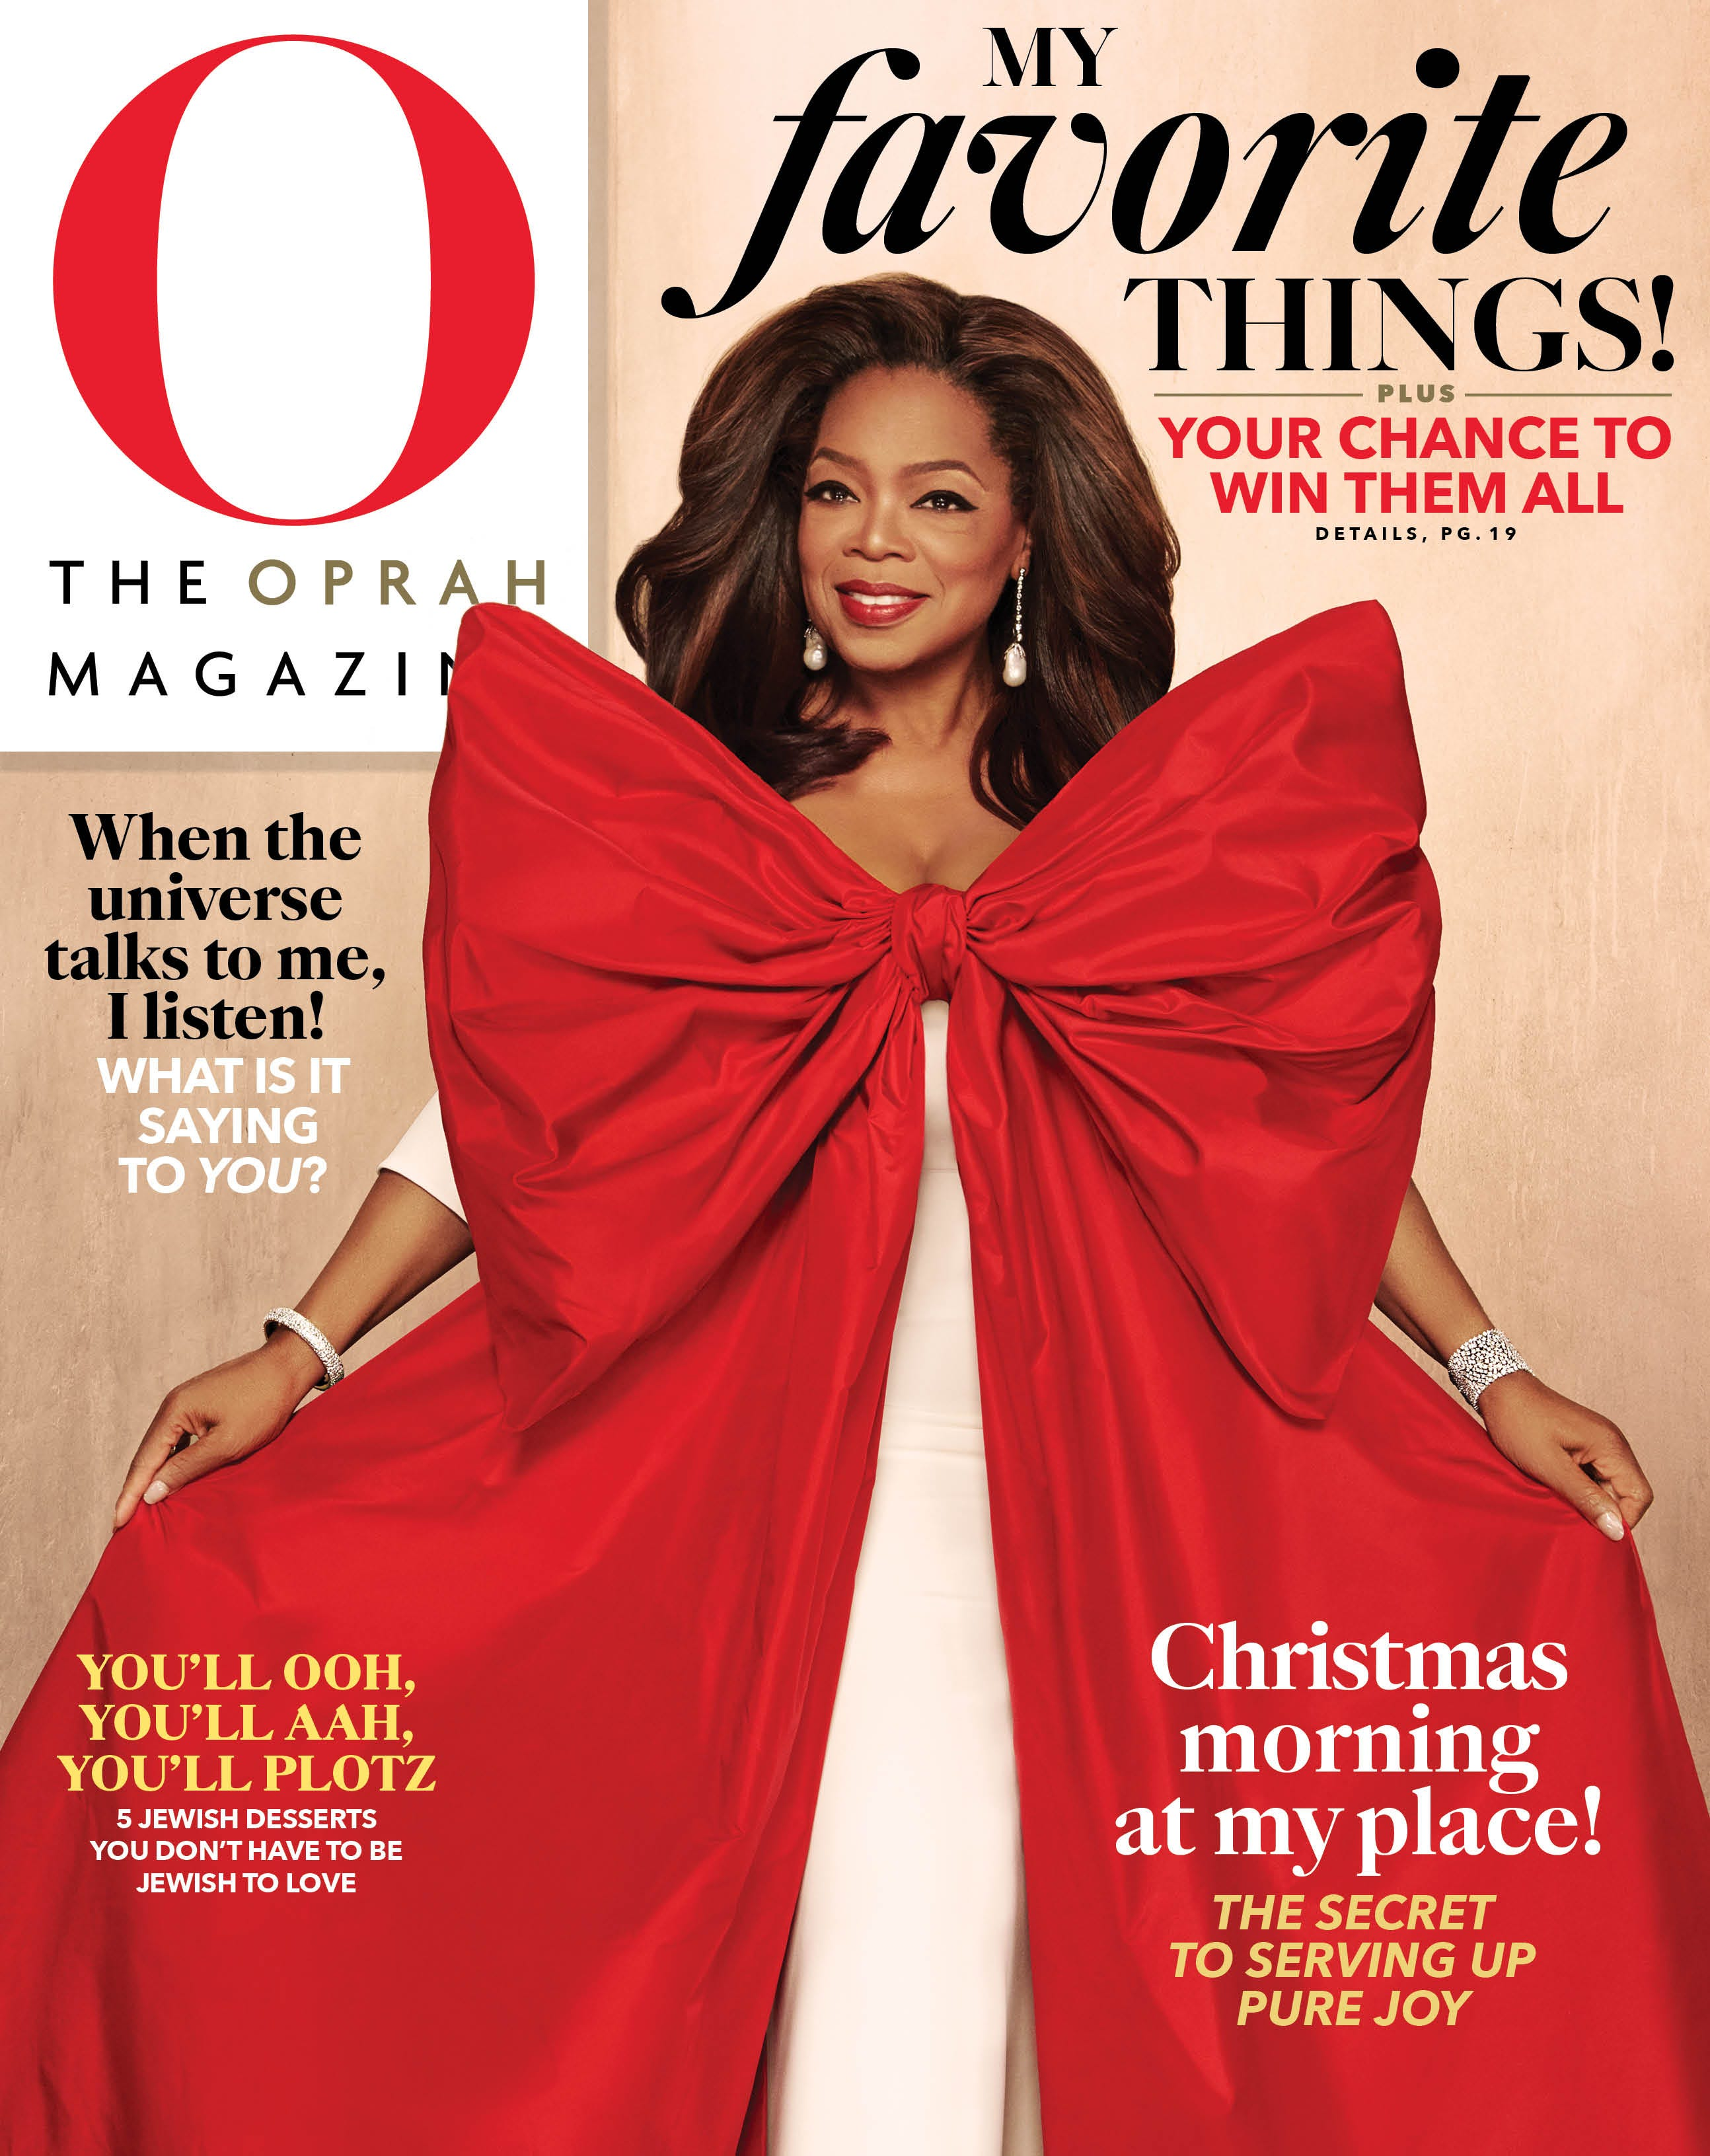 Oprahs Favorite Things Christmas 2020 Oprah Winfrey reveals her favorite things for 2019